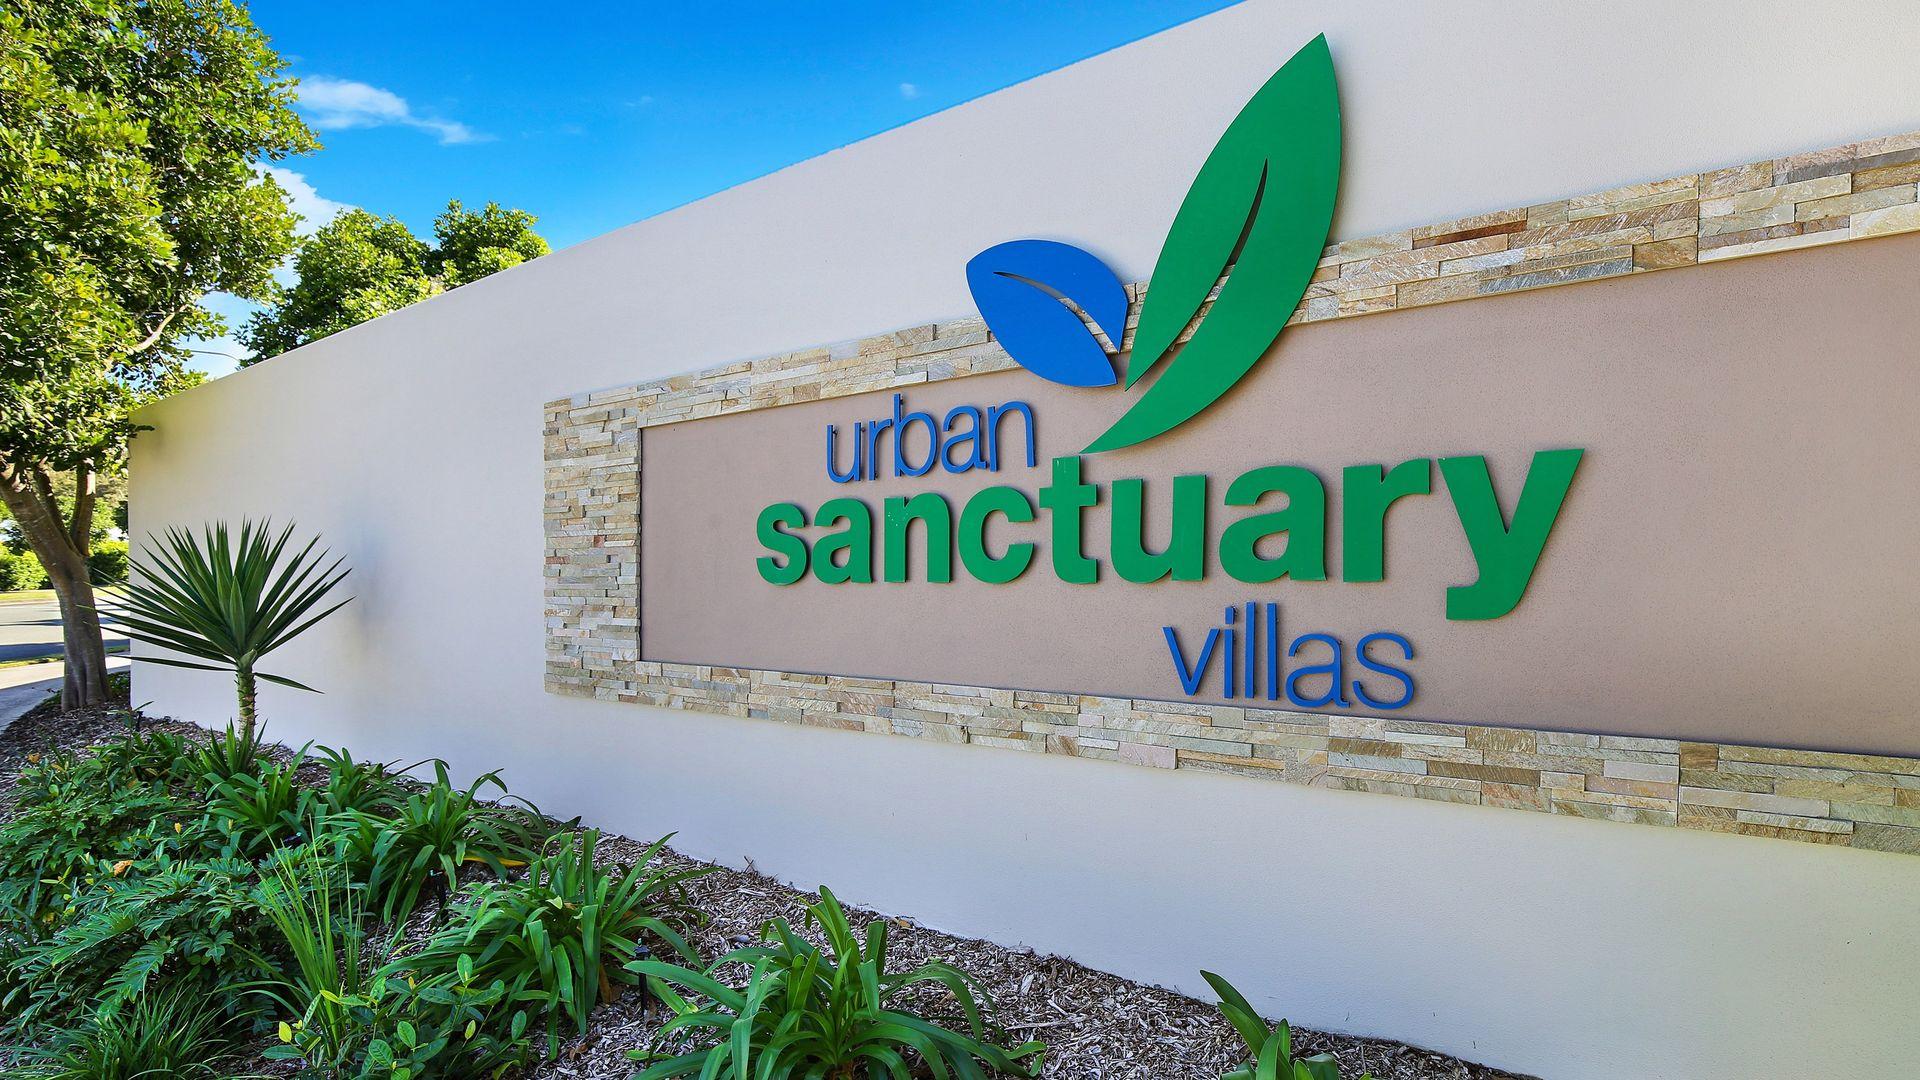 8/47 Sycamore Dr - Urban Sanctuary Villas, Currimundi QLD 4551, Image 10